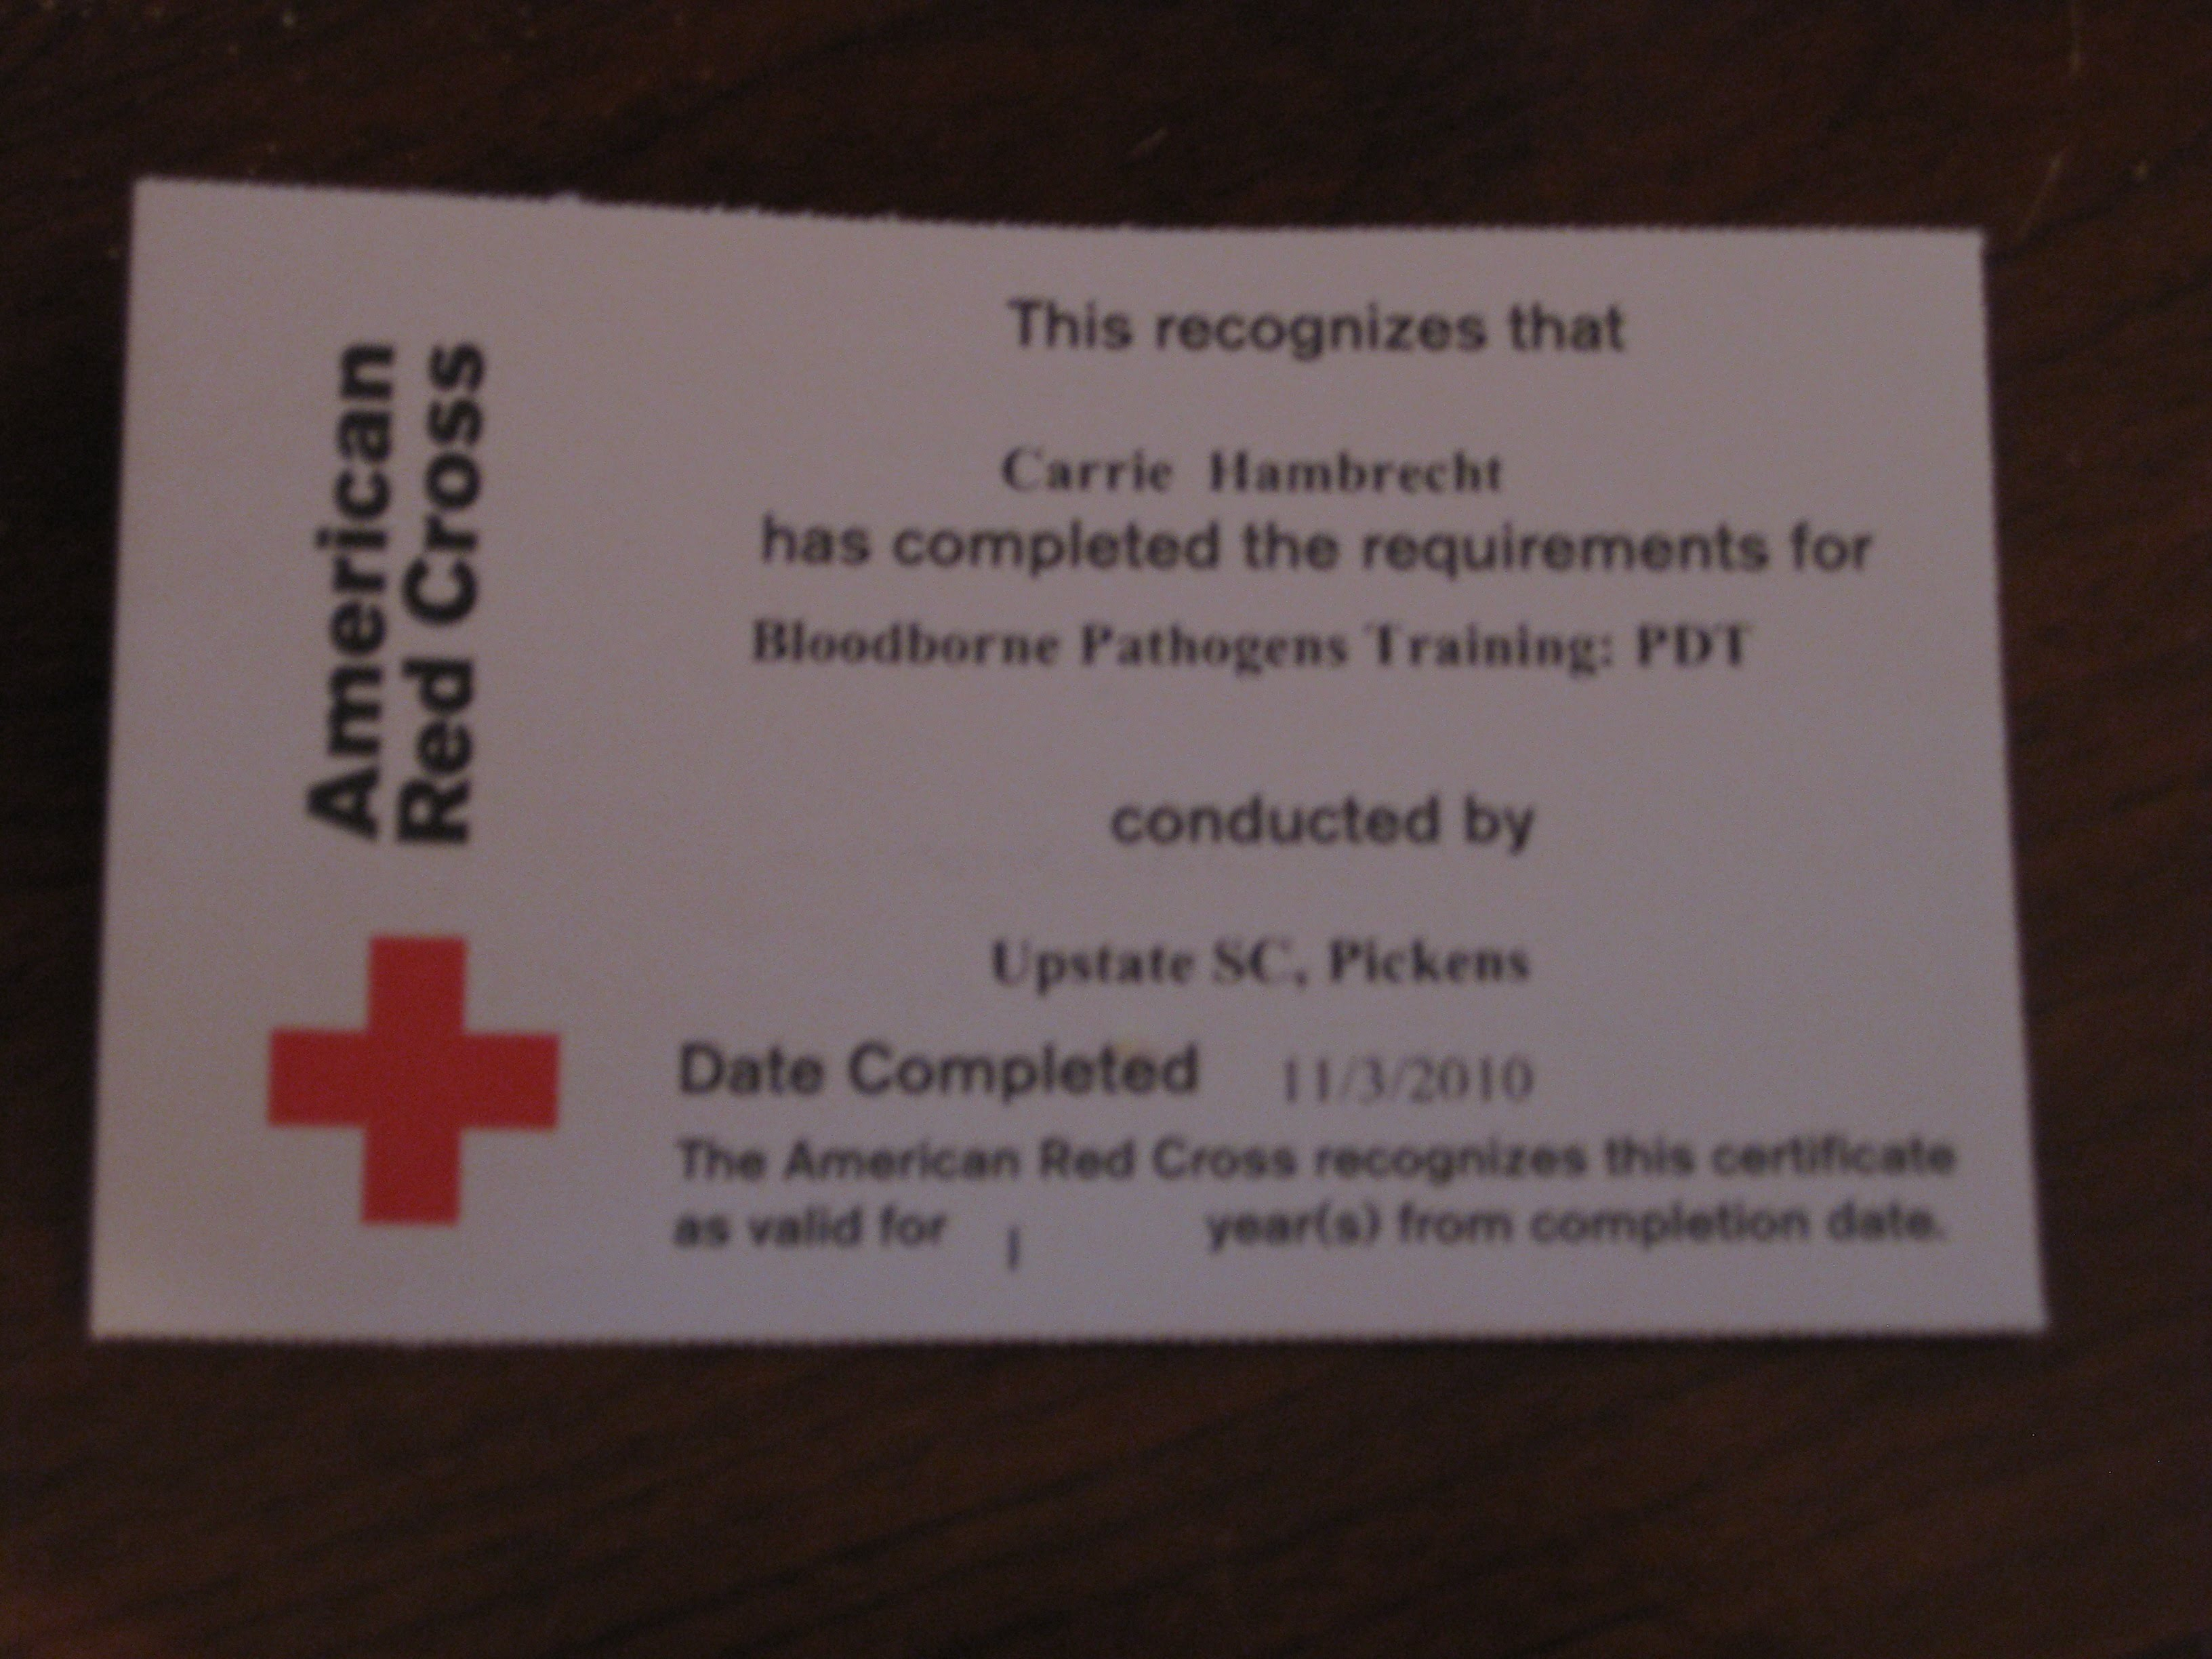 Bloodborne Pathogens Certification Free Professional Resume